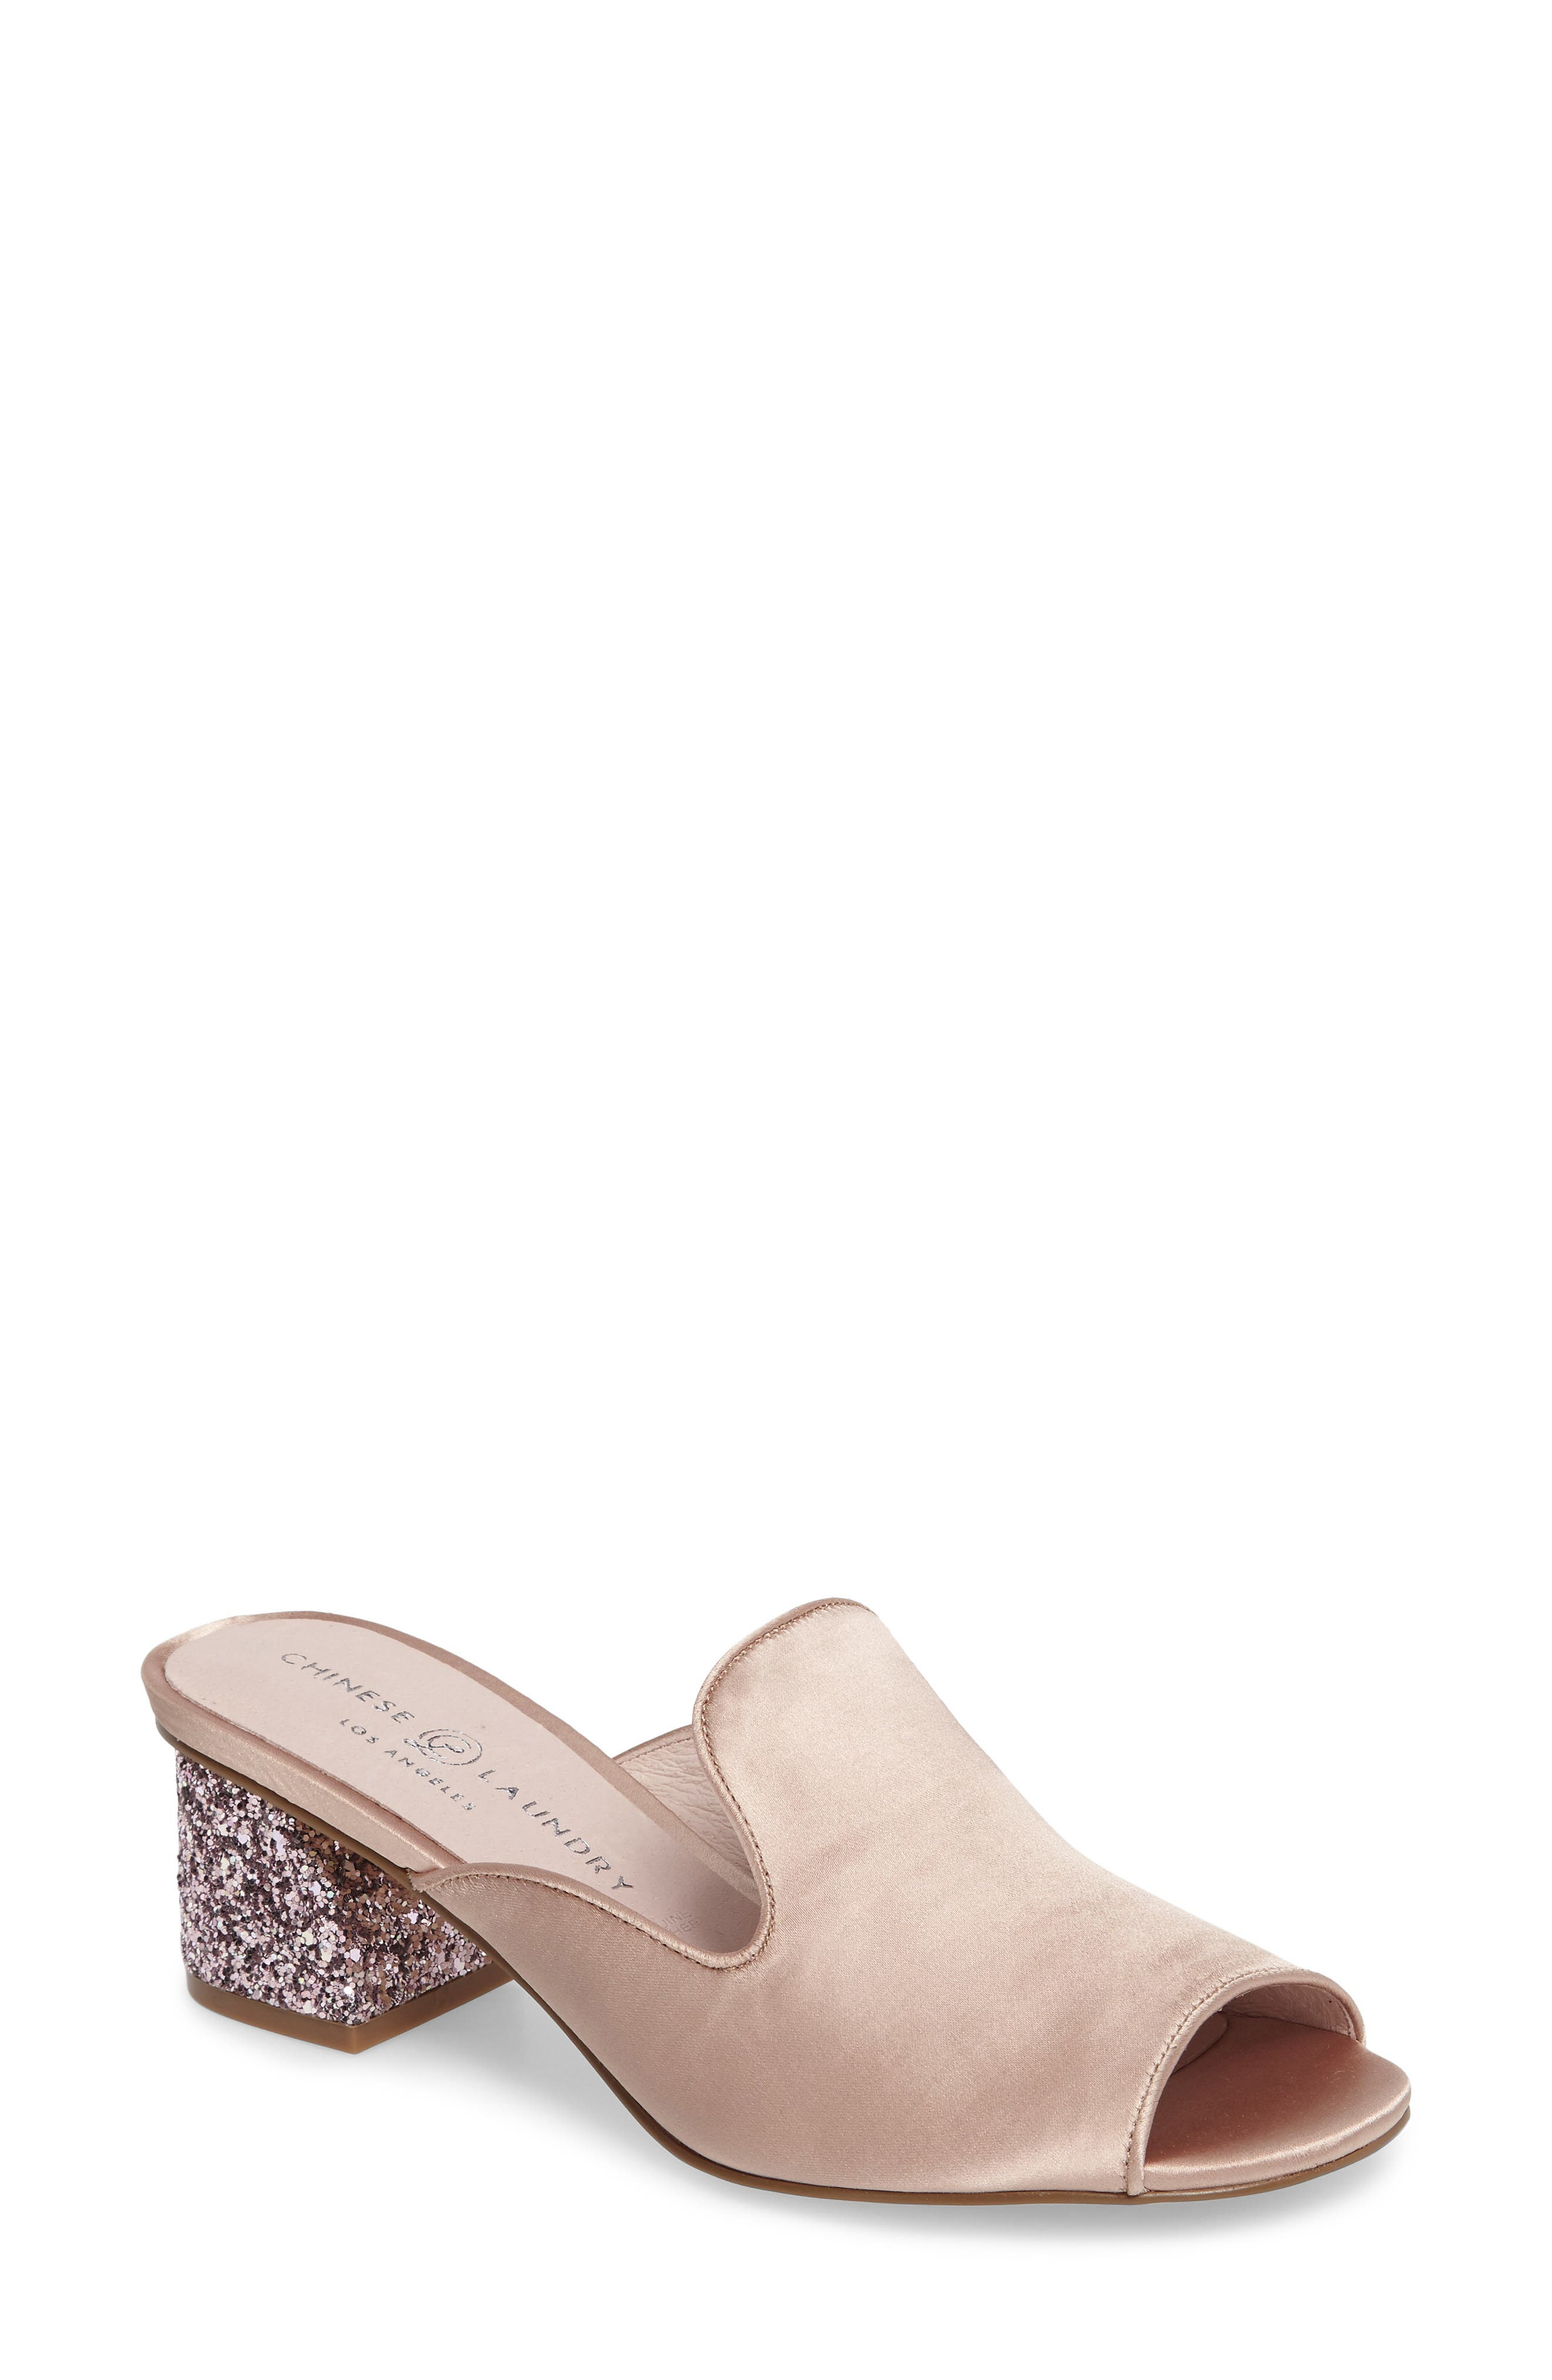 Mara Glitter Loafer Mule,                         Main,                         color, Summer Nude Satin